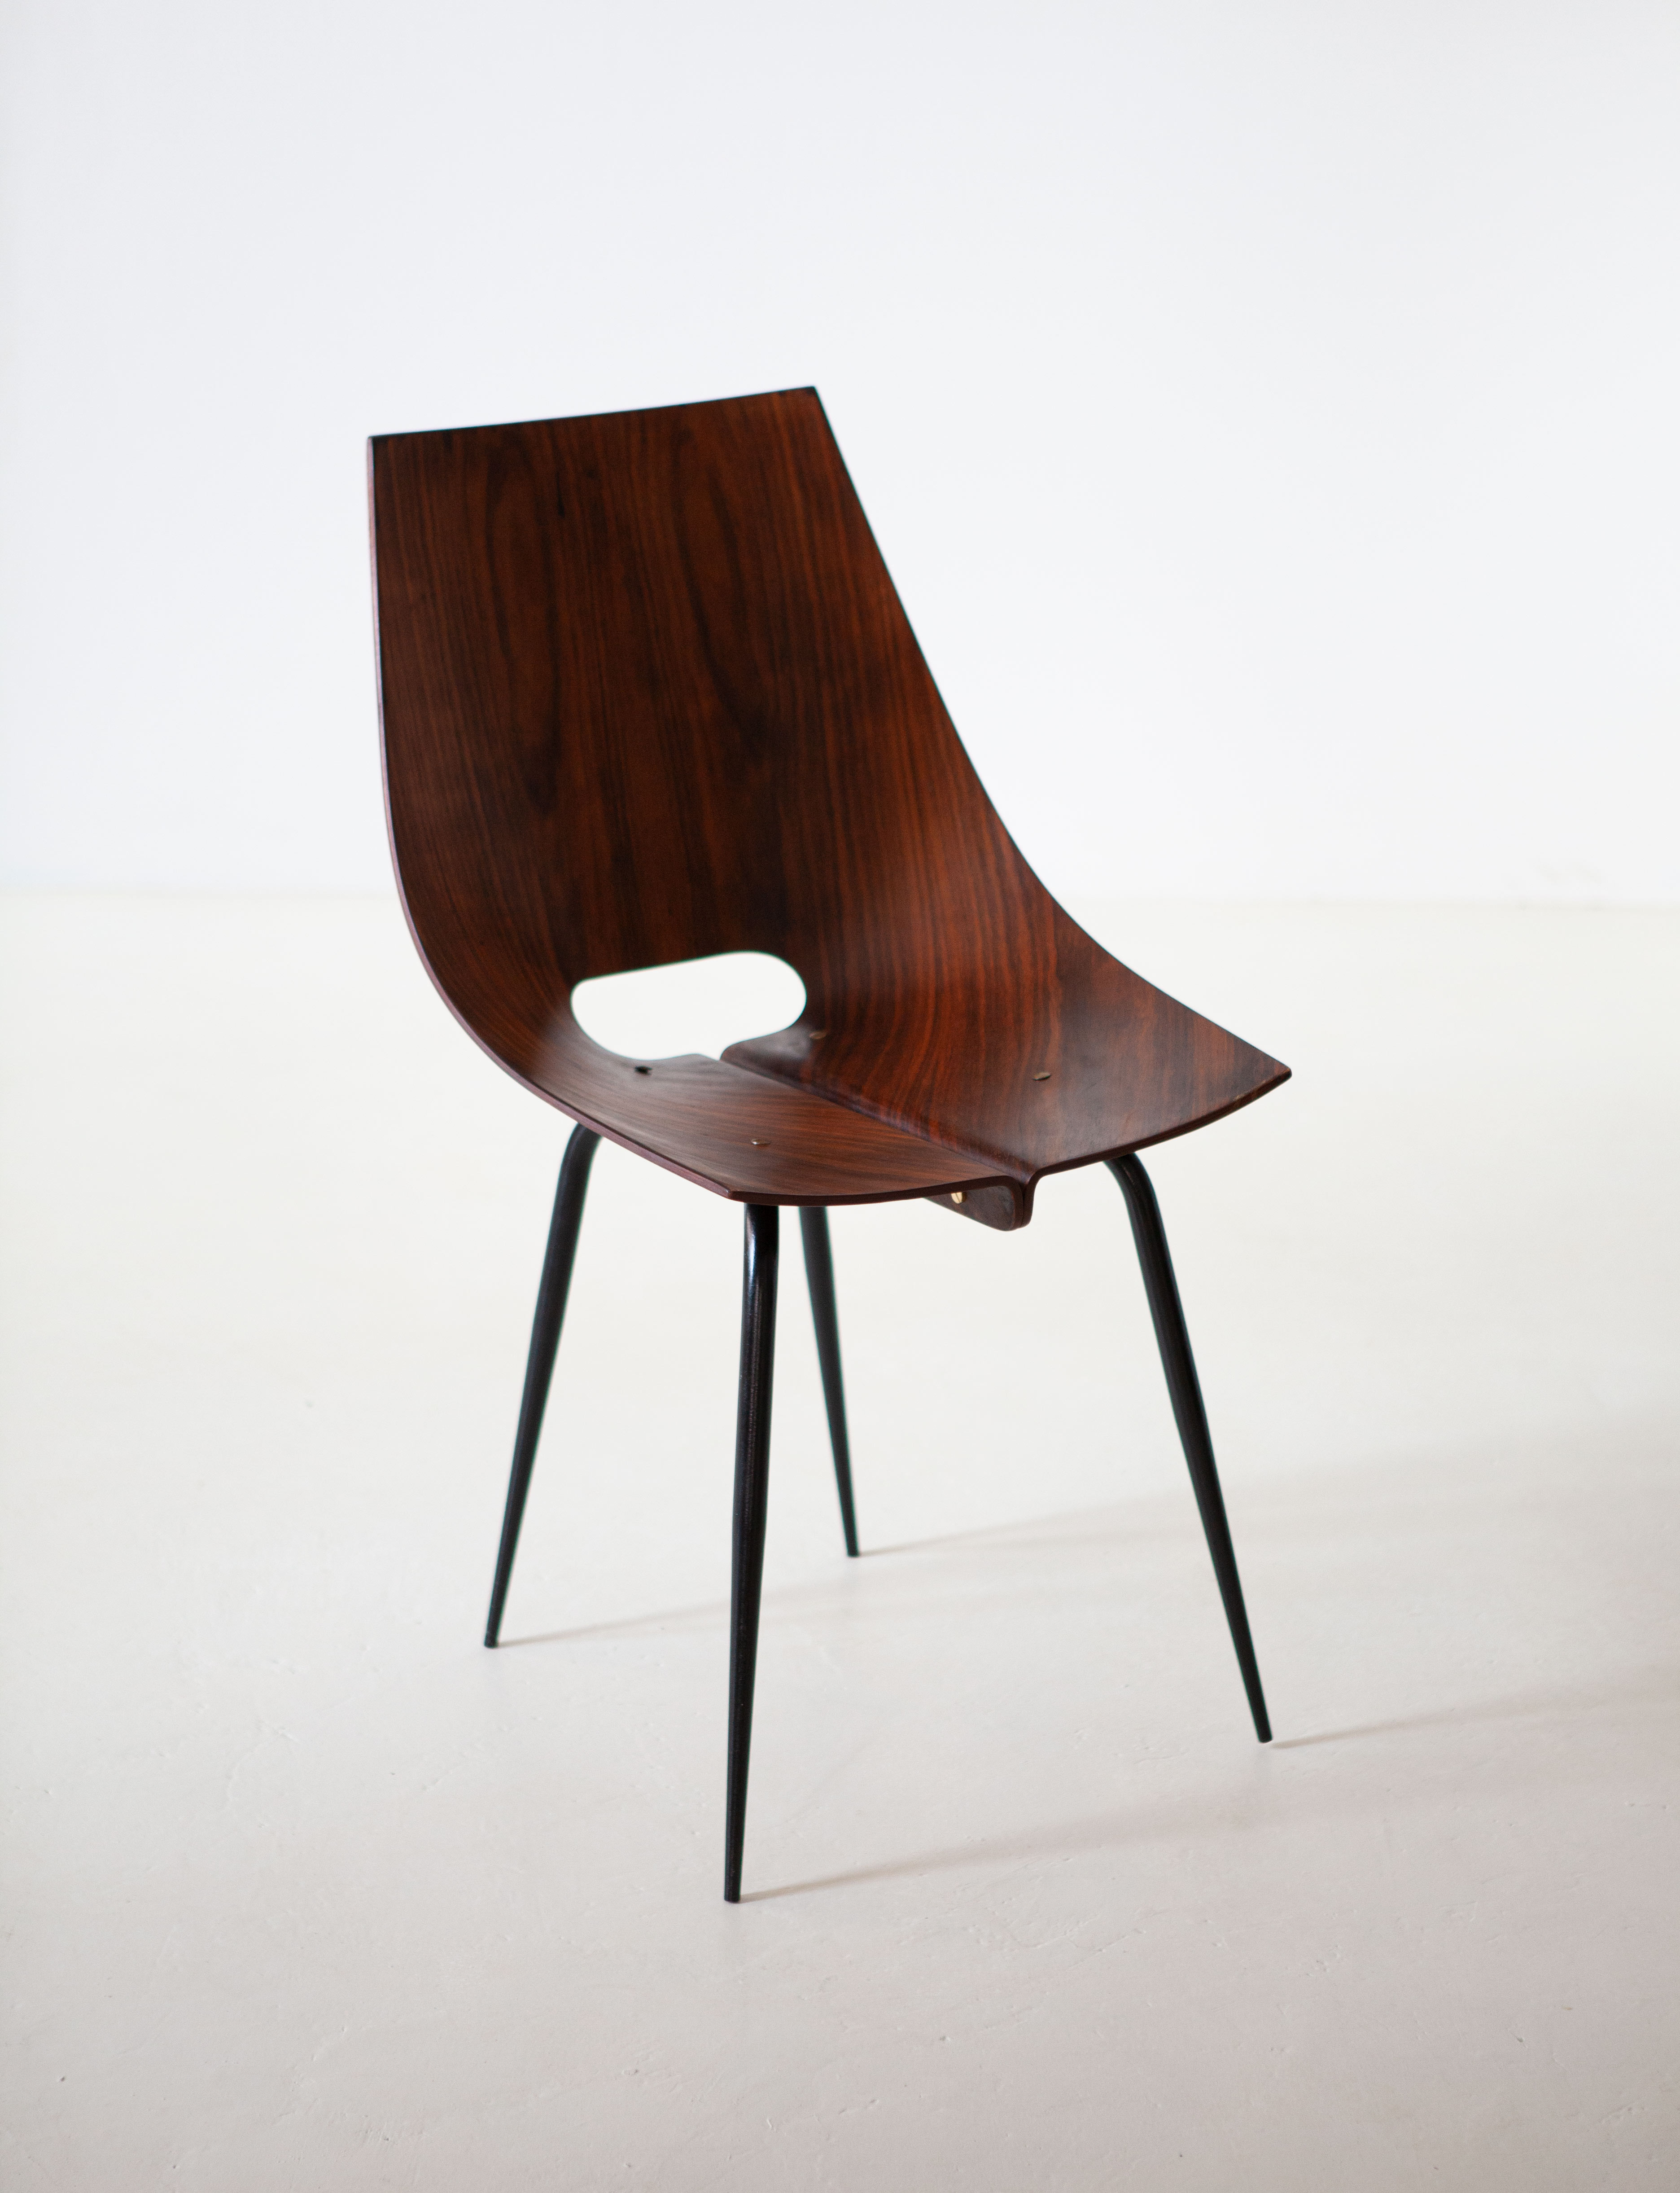 1950s-modern-curved-rosewood-chair-by-societa-compensati-curvati-3-se312